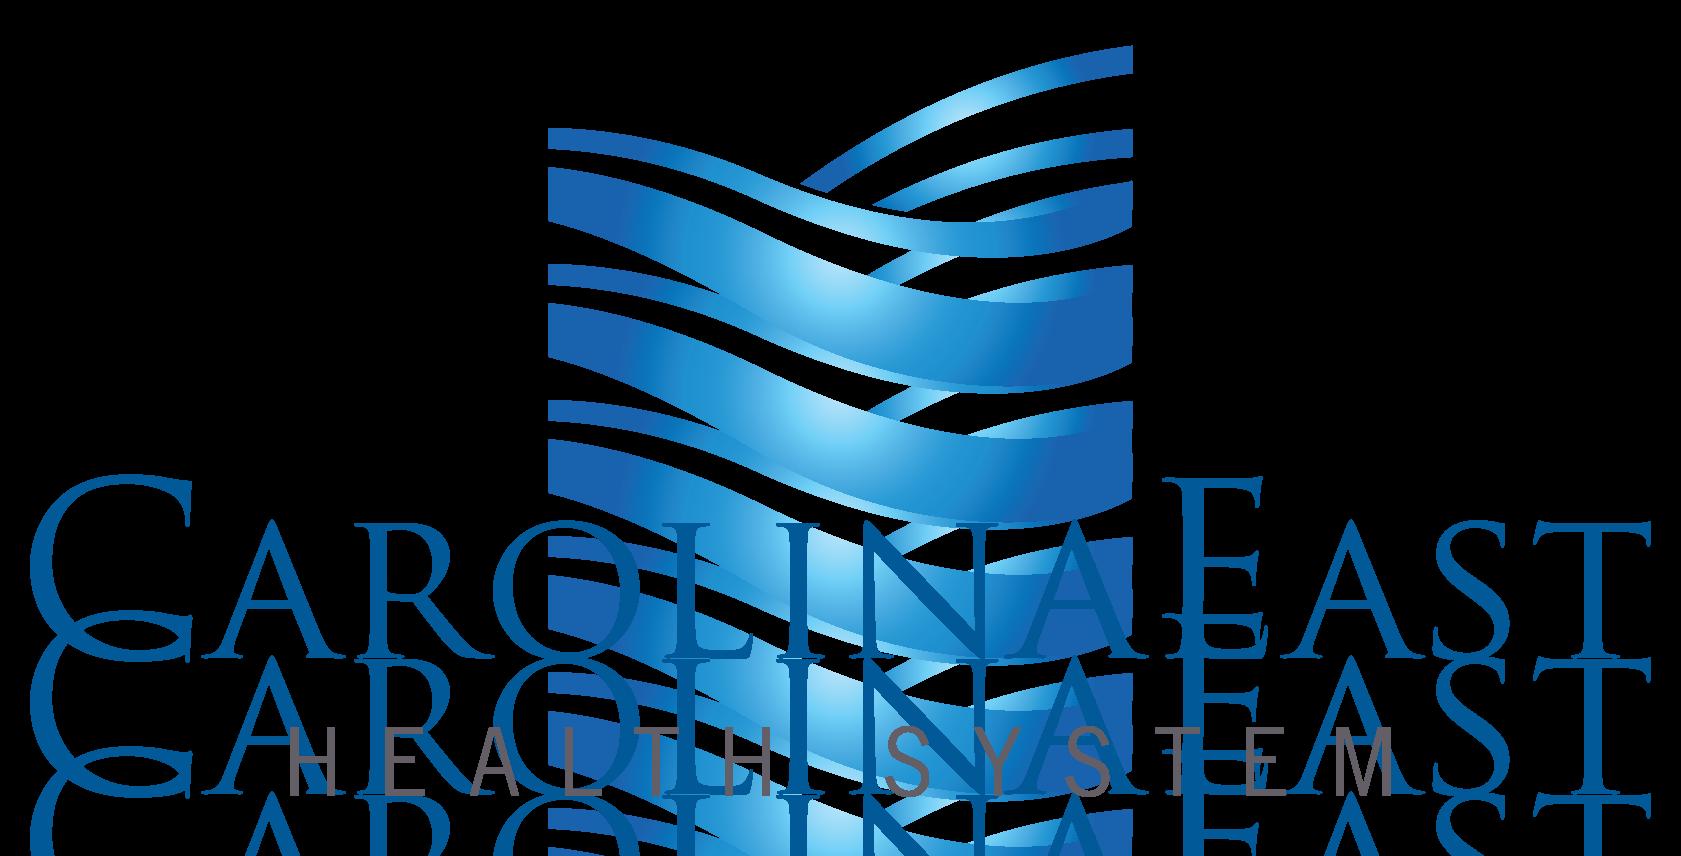 CarolinaEast_HealthSystem_VERTICAL_GLOW